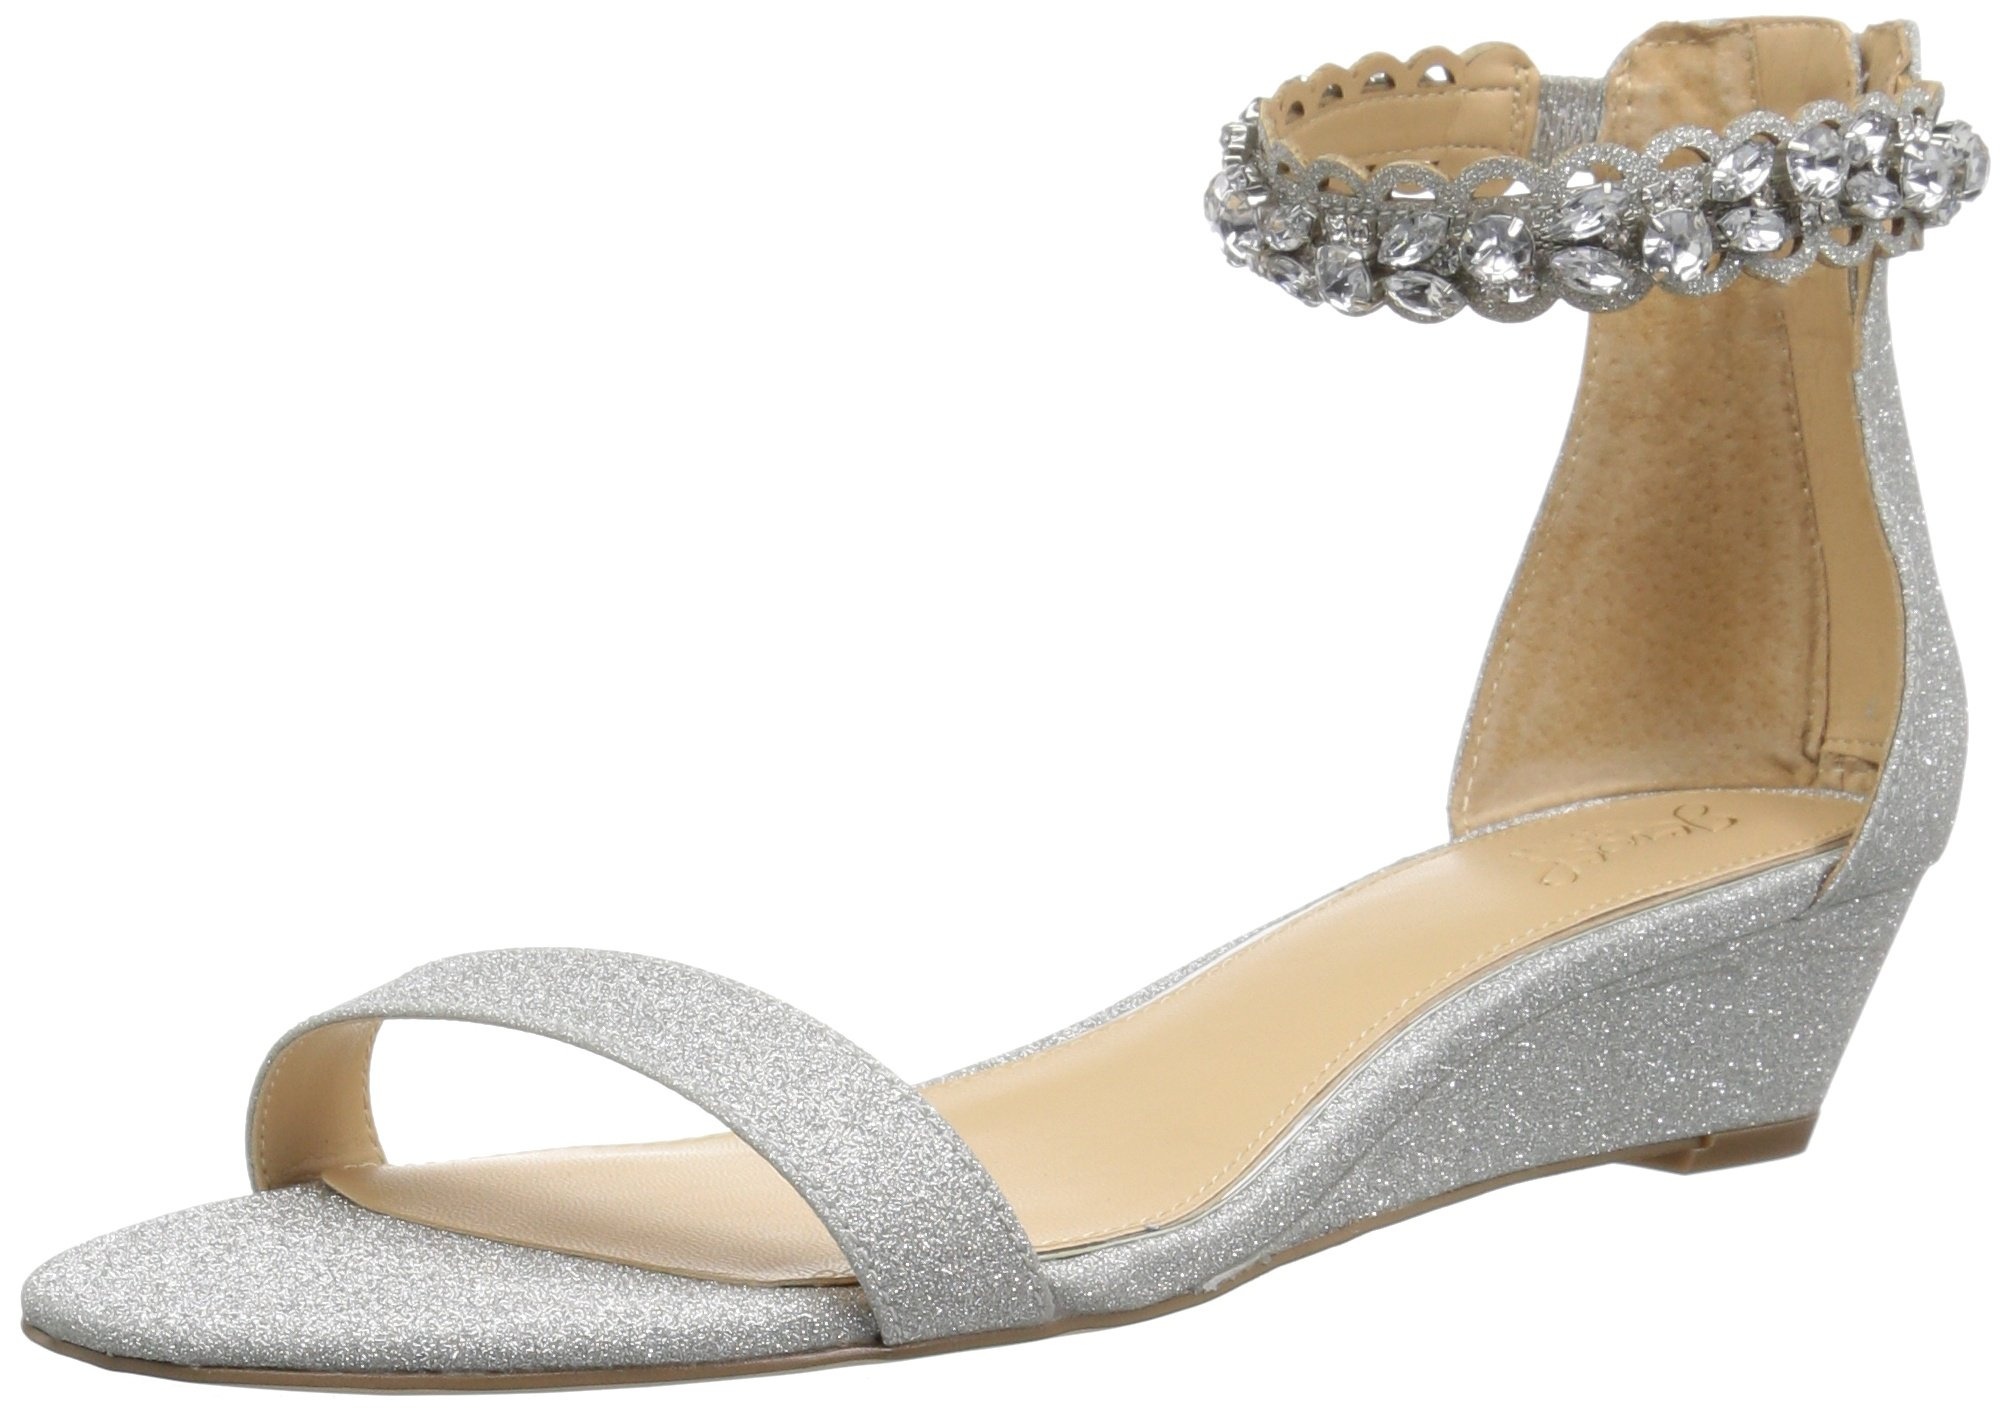 Badgley Mischka Jewel Women's Ginger Wedge Sandal, Silver, 9 Medium US